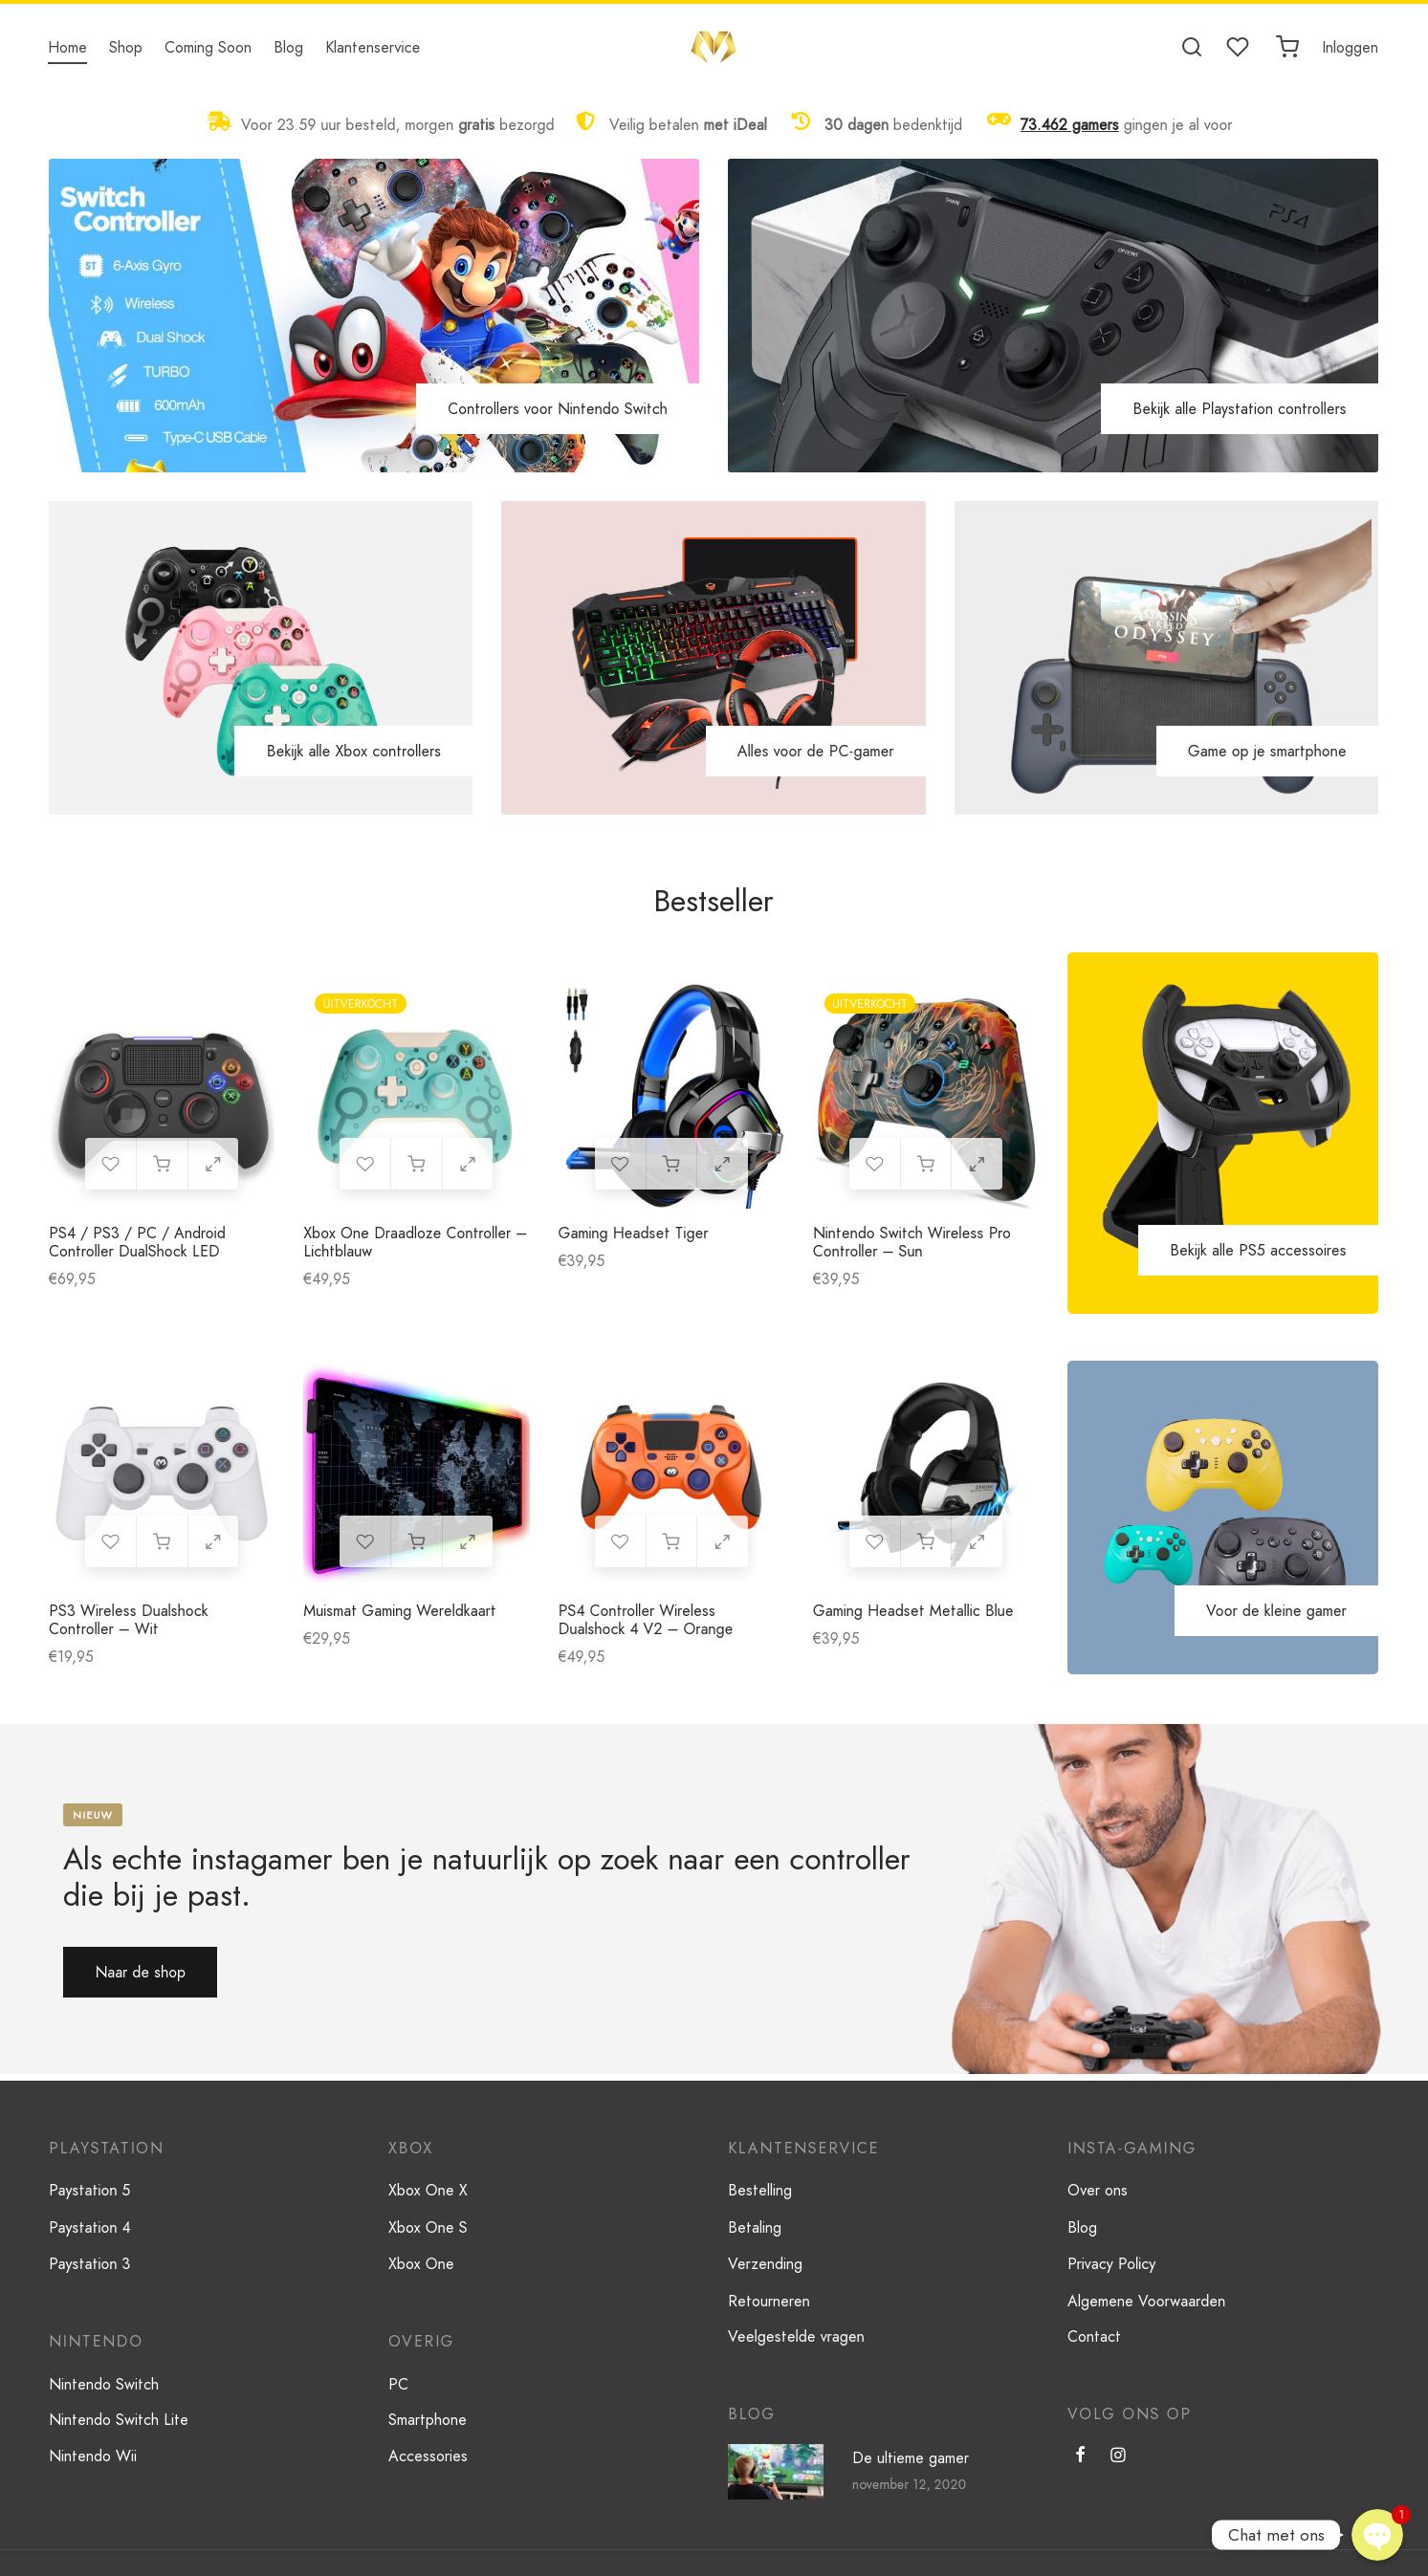 Insta-Gaming